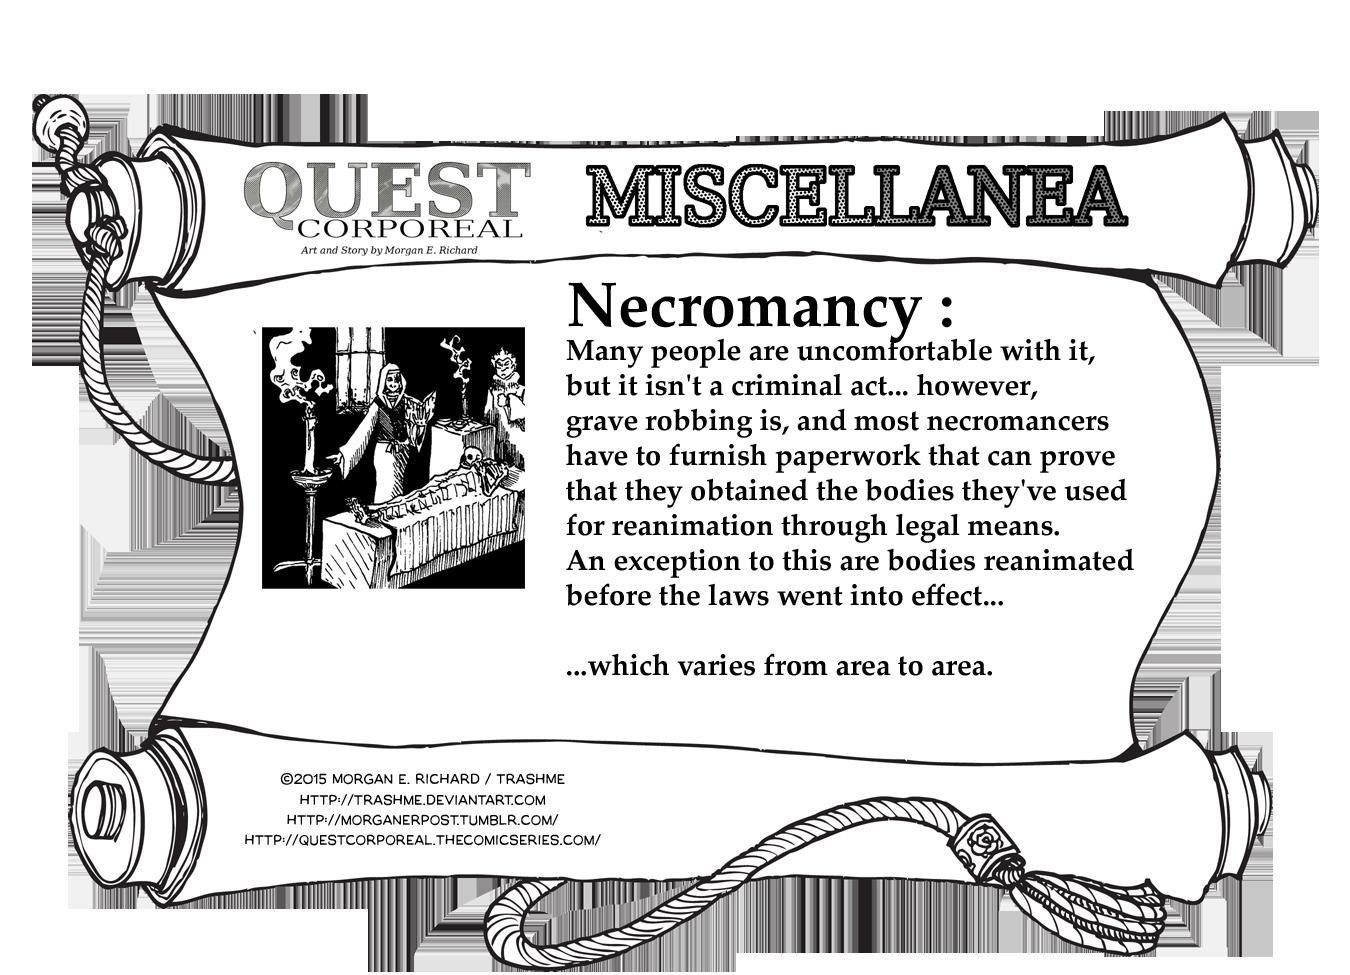 Miscellanea Corporeal: Necromancy